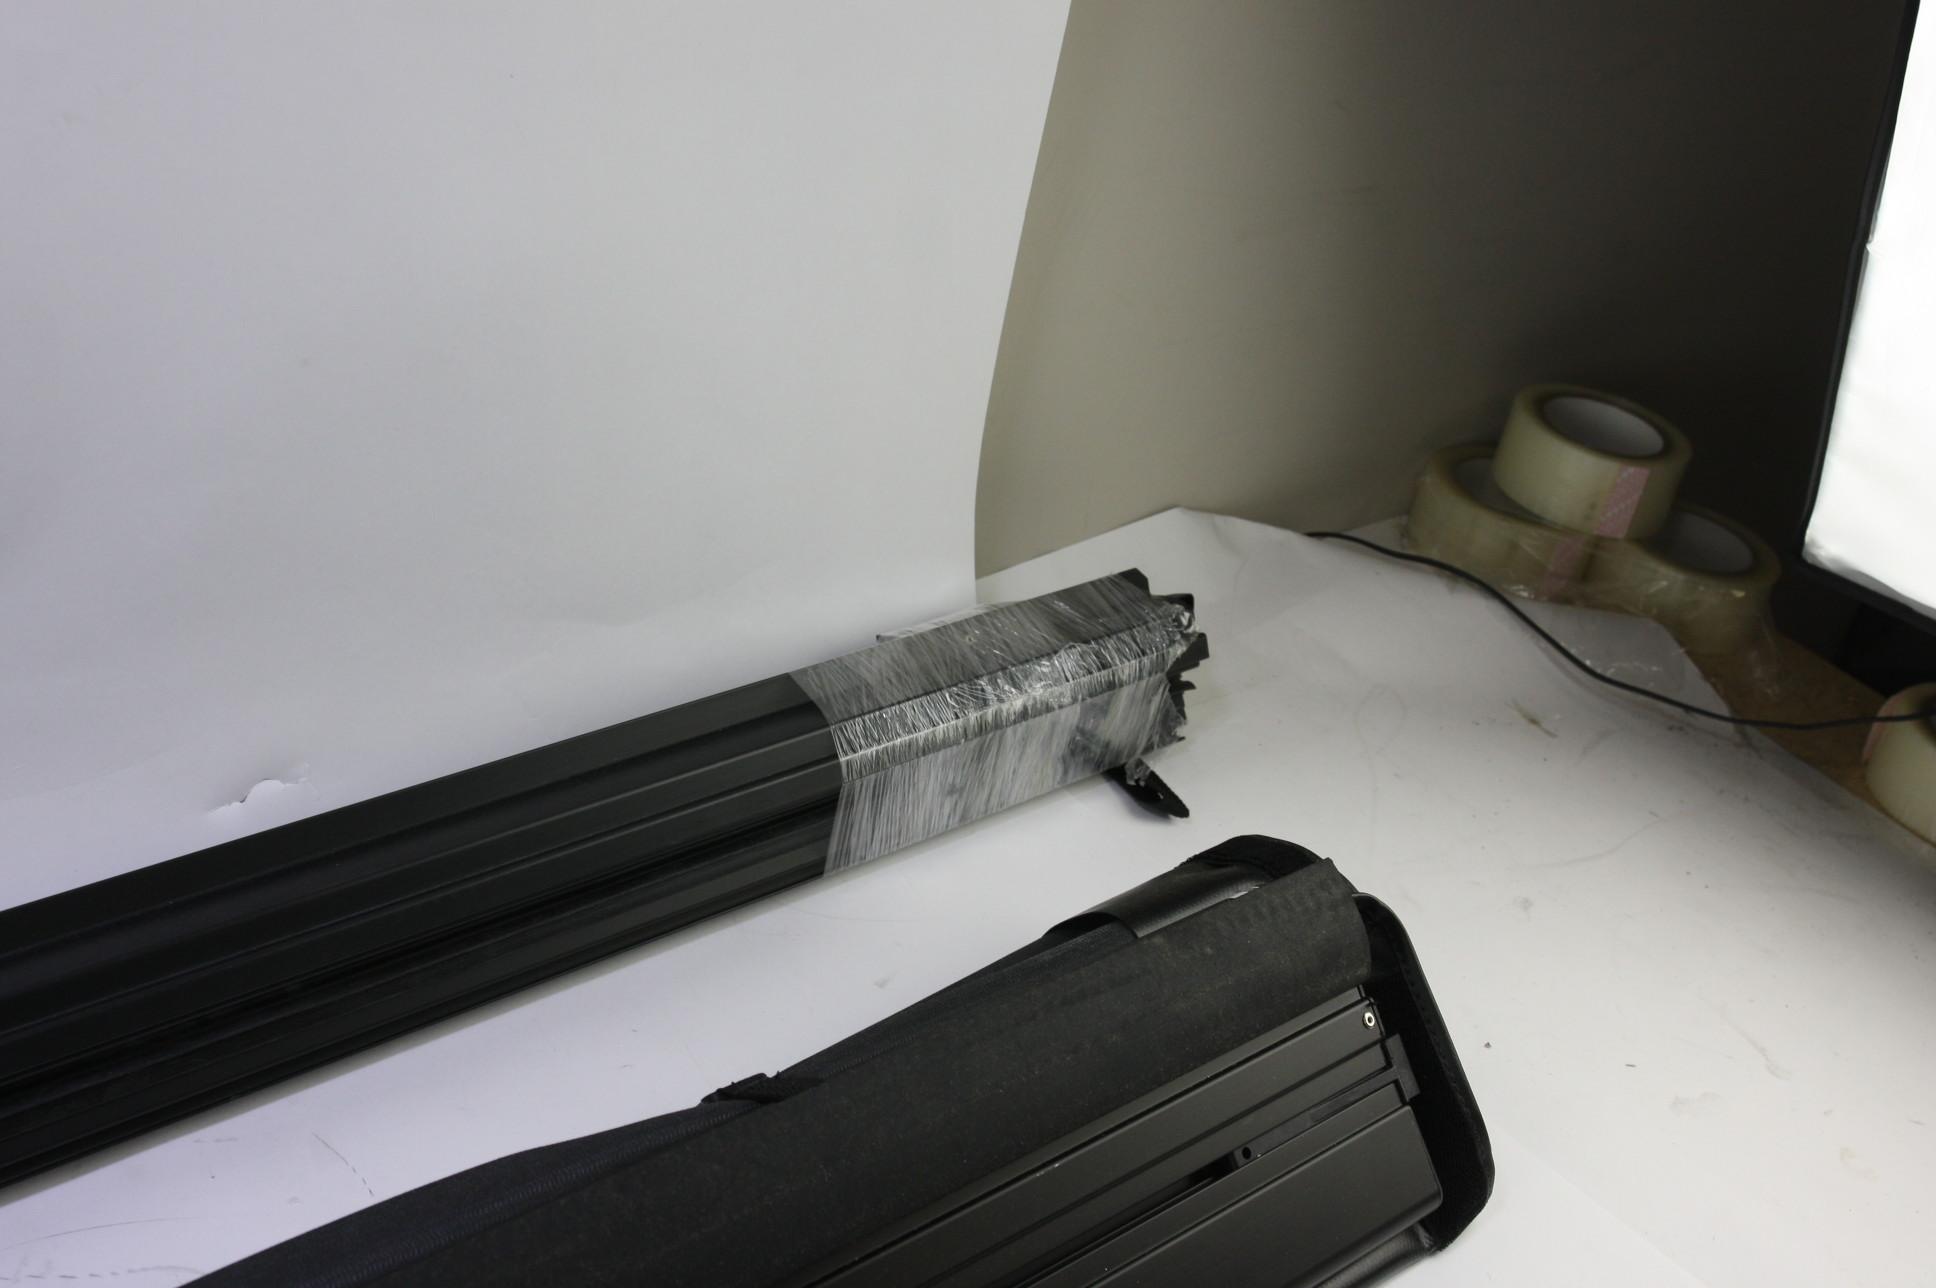 * New OEM 82213024-AE Genuine Mopar Tonneau Soft Cover Black Roll Up Ram NIP - image 7